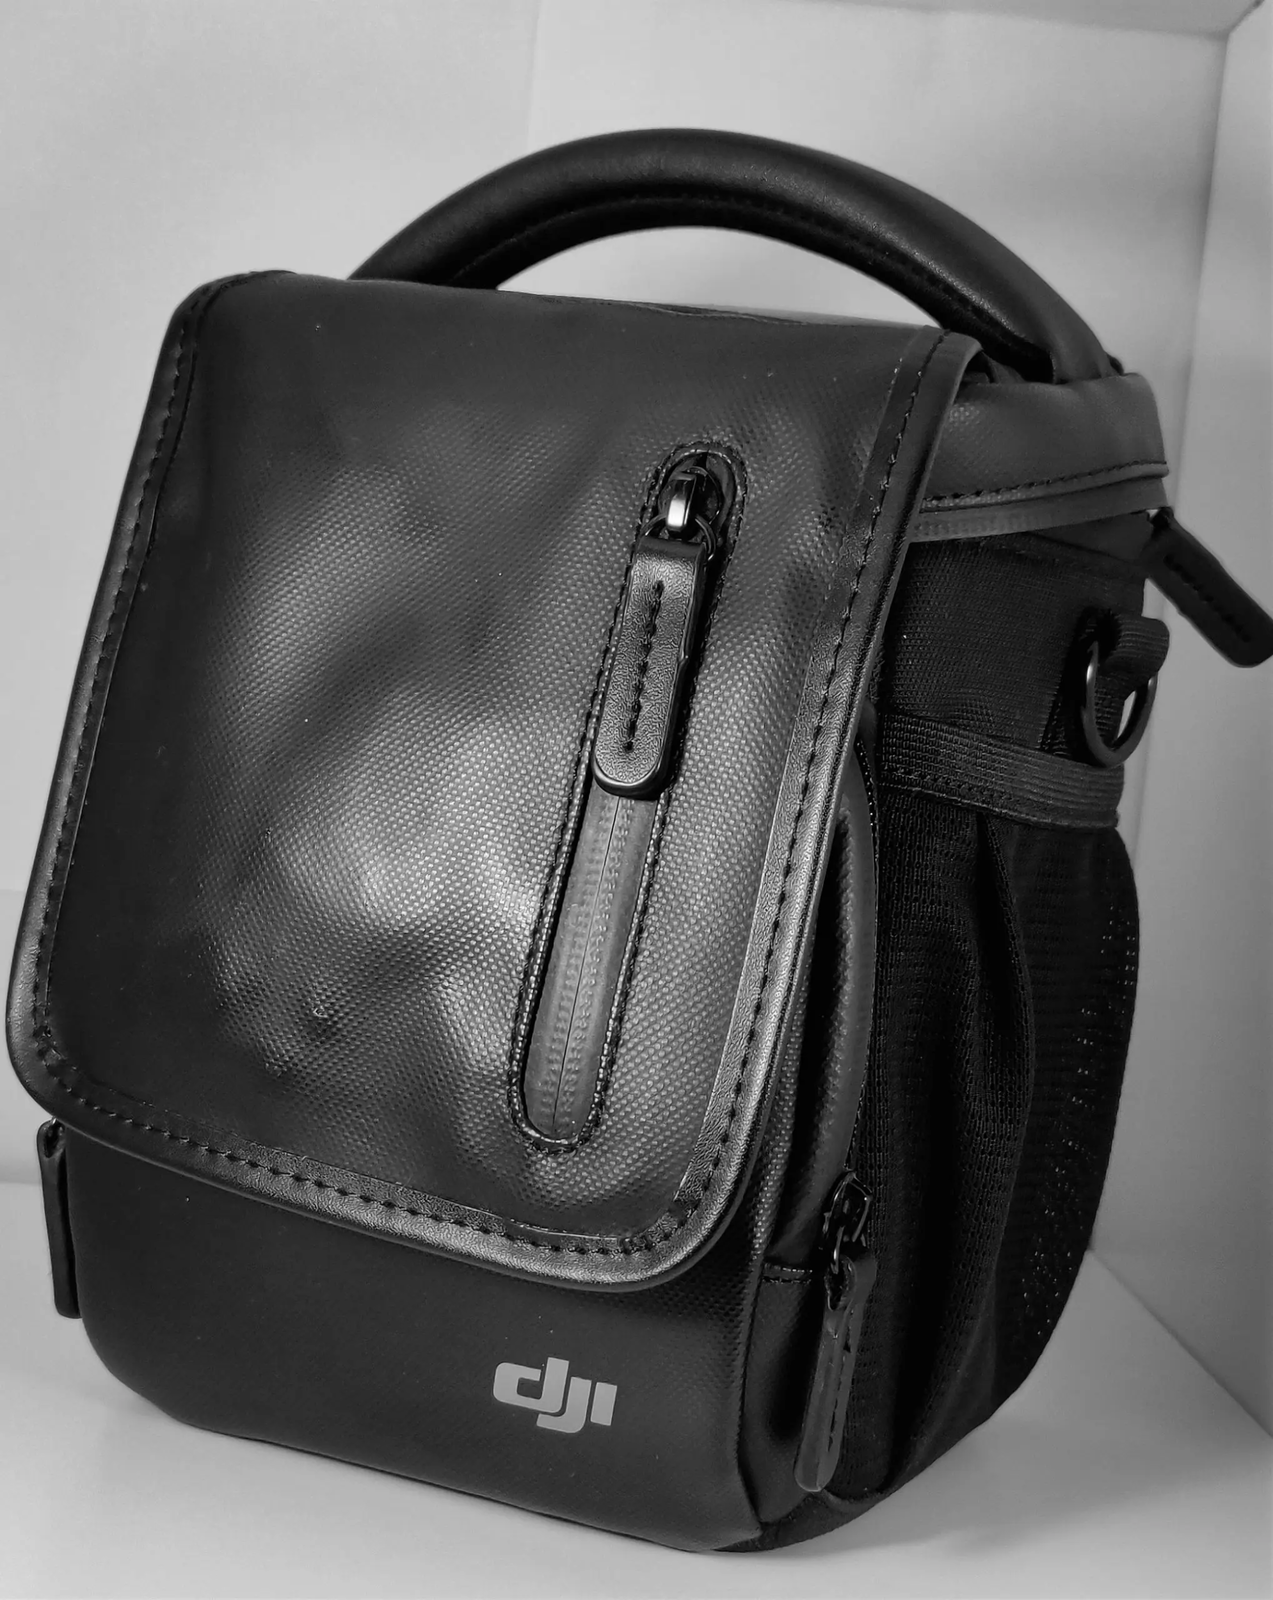 GENUINE DJI Mavic Pro Carry Case / Bag From Fly More Kit - Genuine